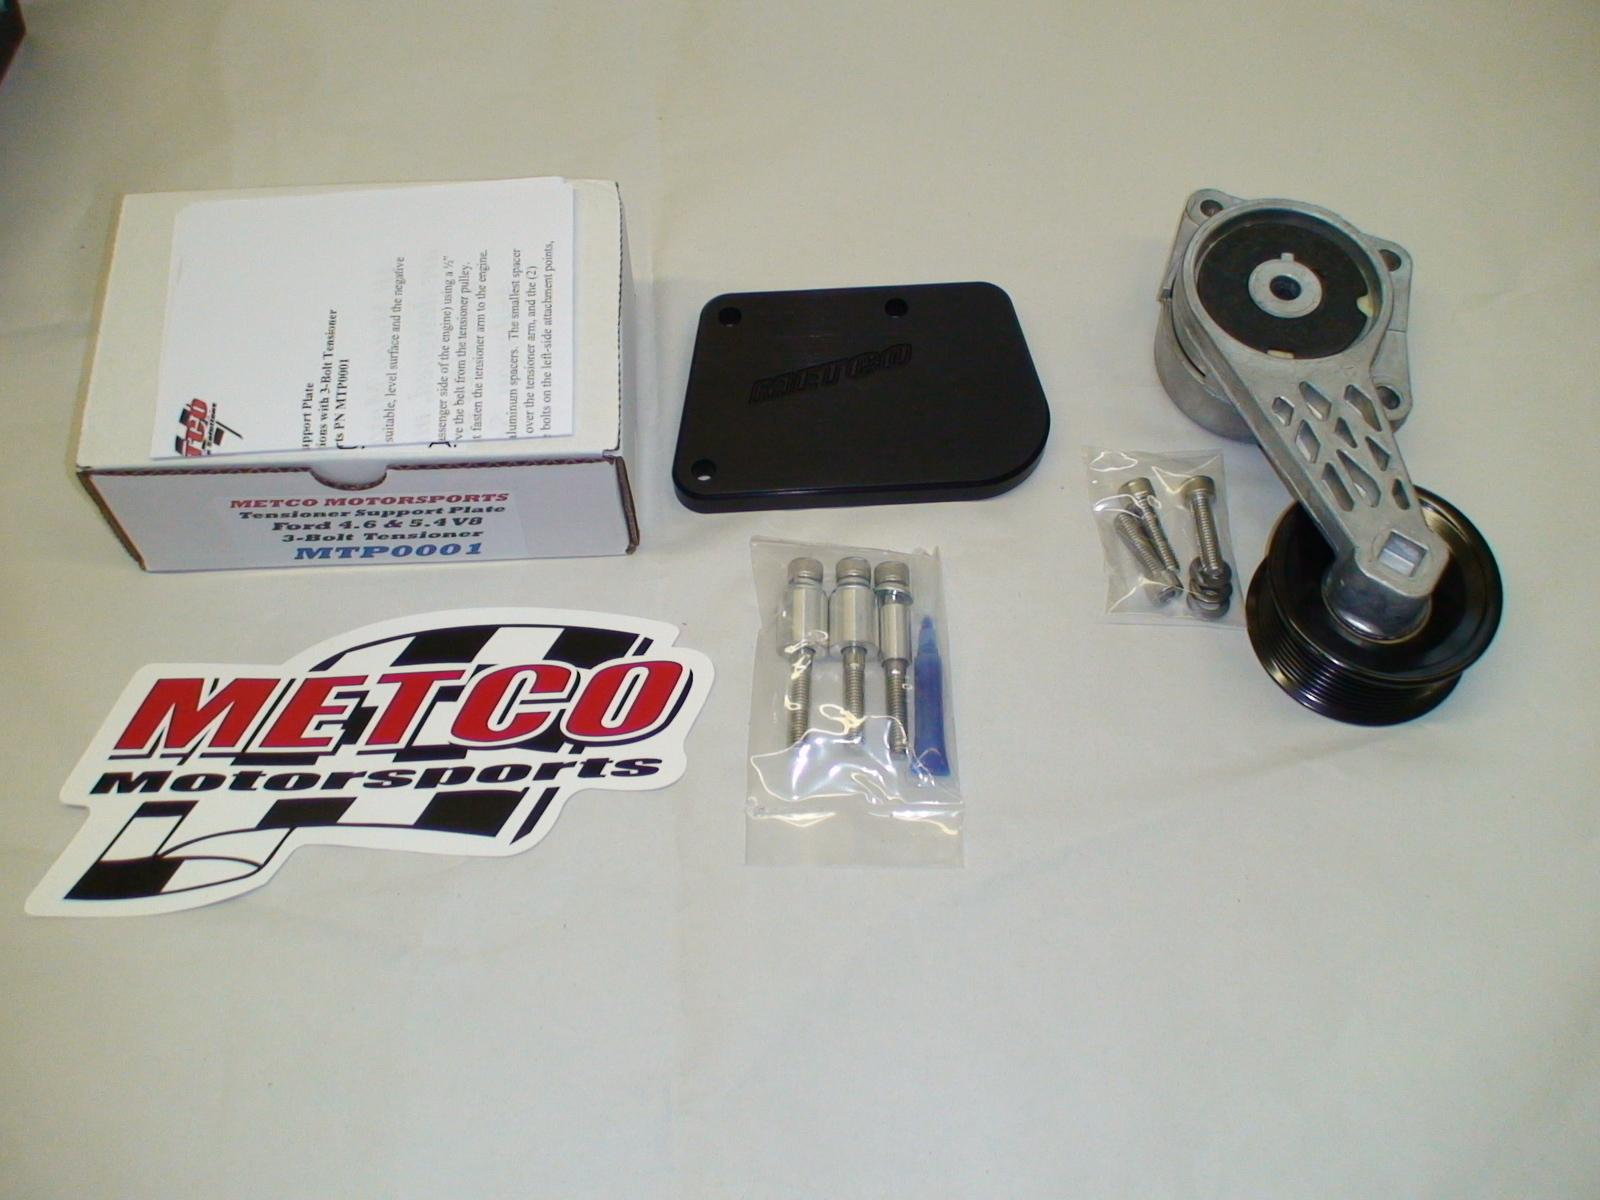 JLT high boost cold air intake 03-04 supercharged Mustang Cobra SVT Terminator